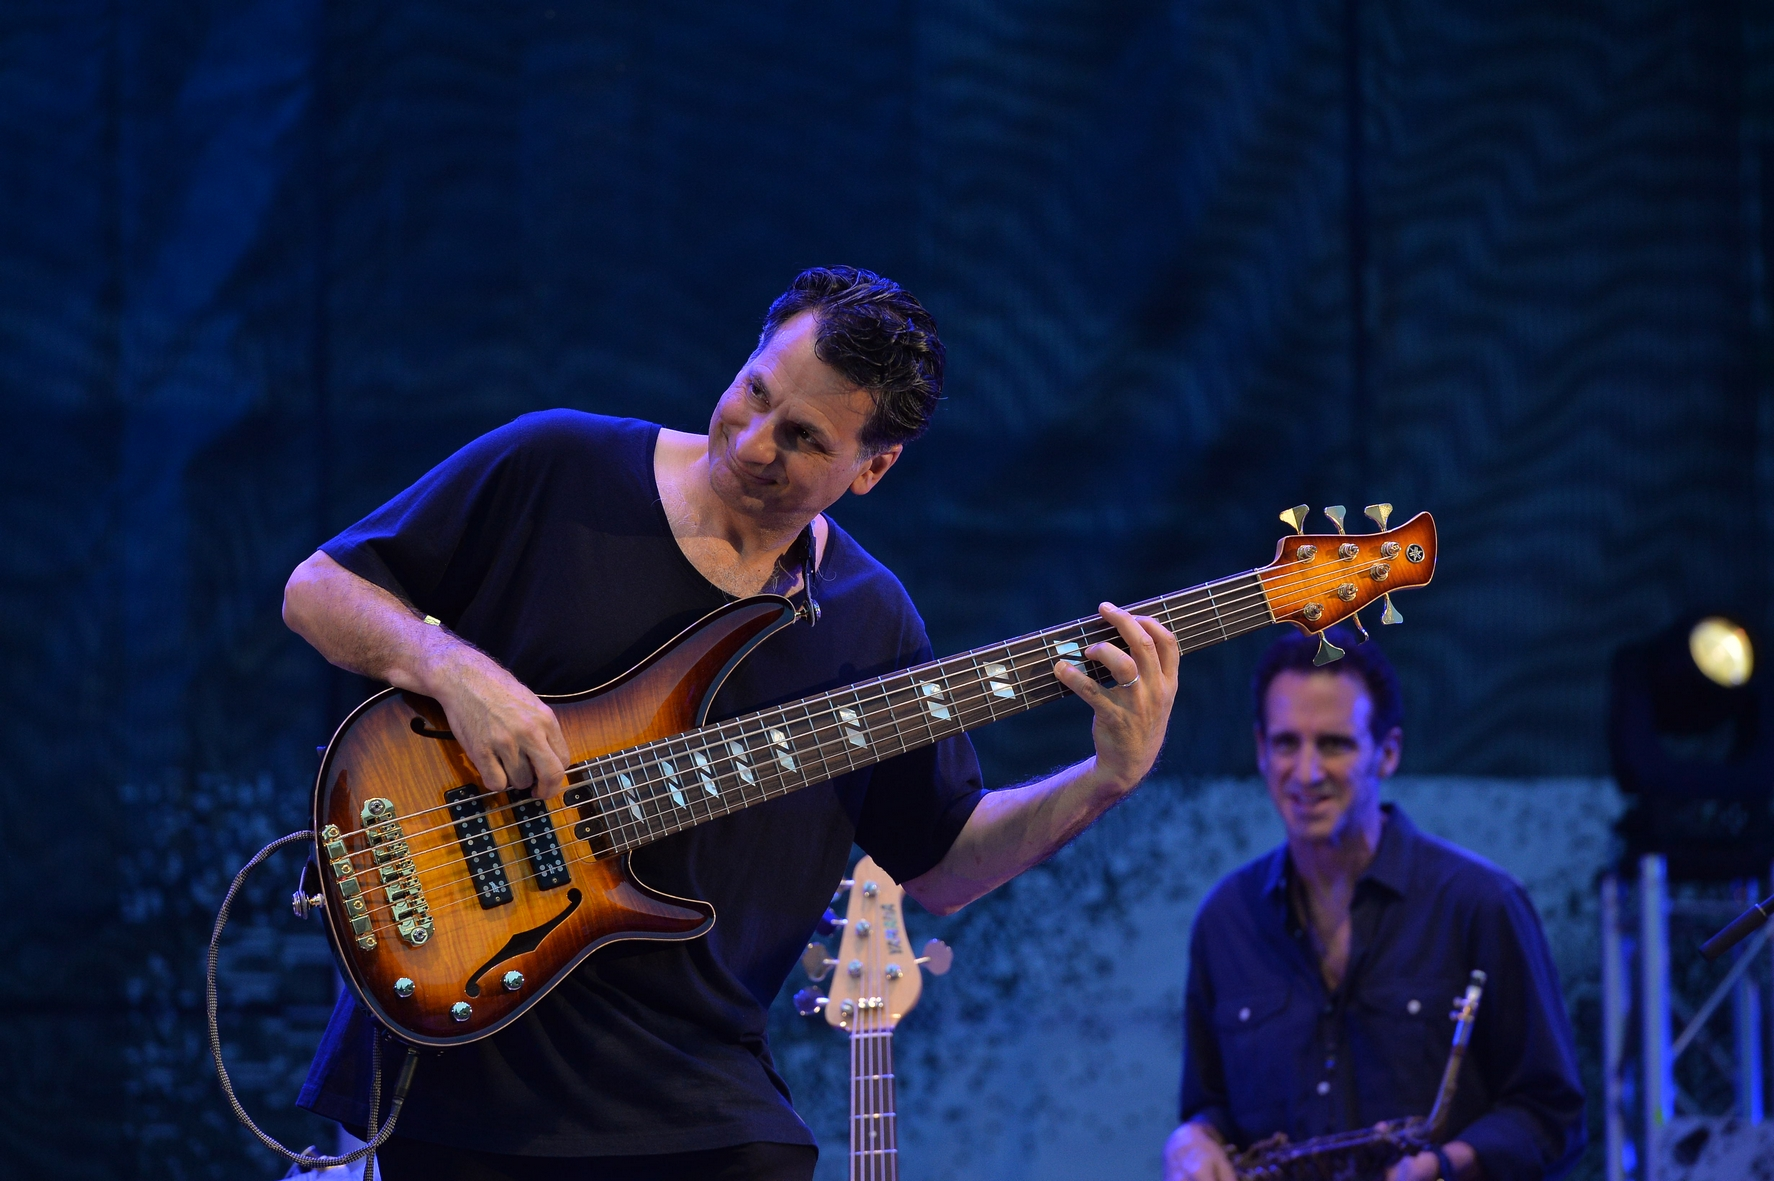 John Patitucci at JazzTM Festival